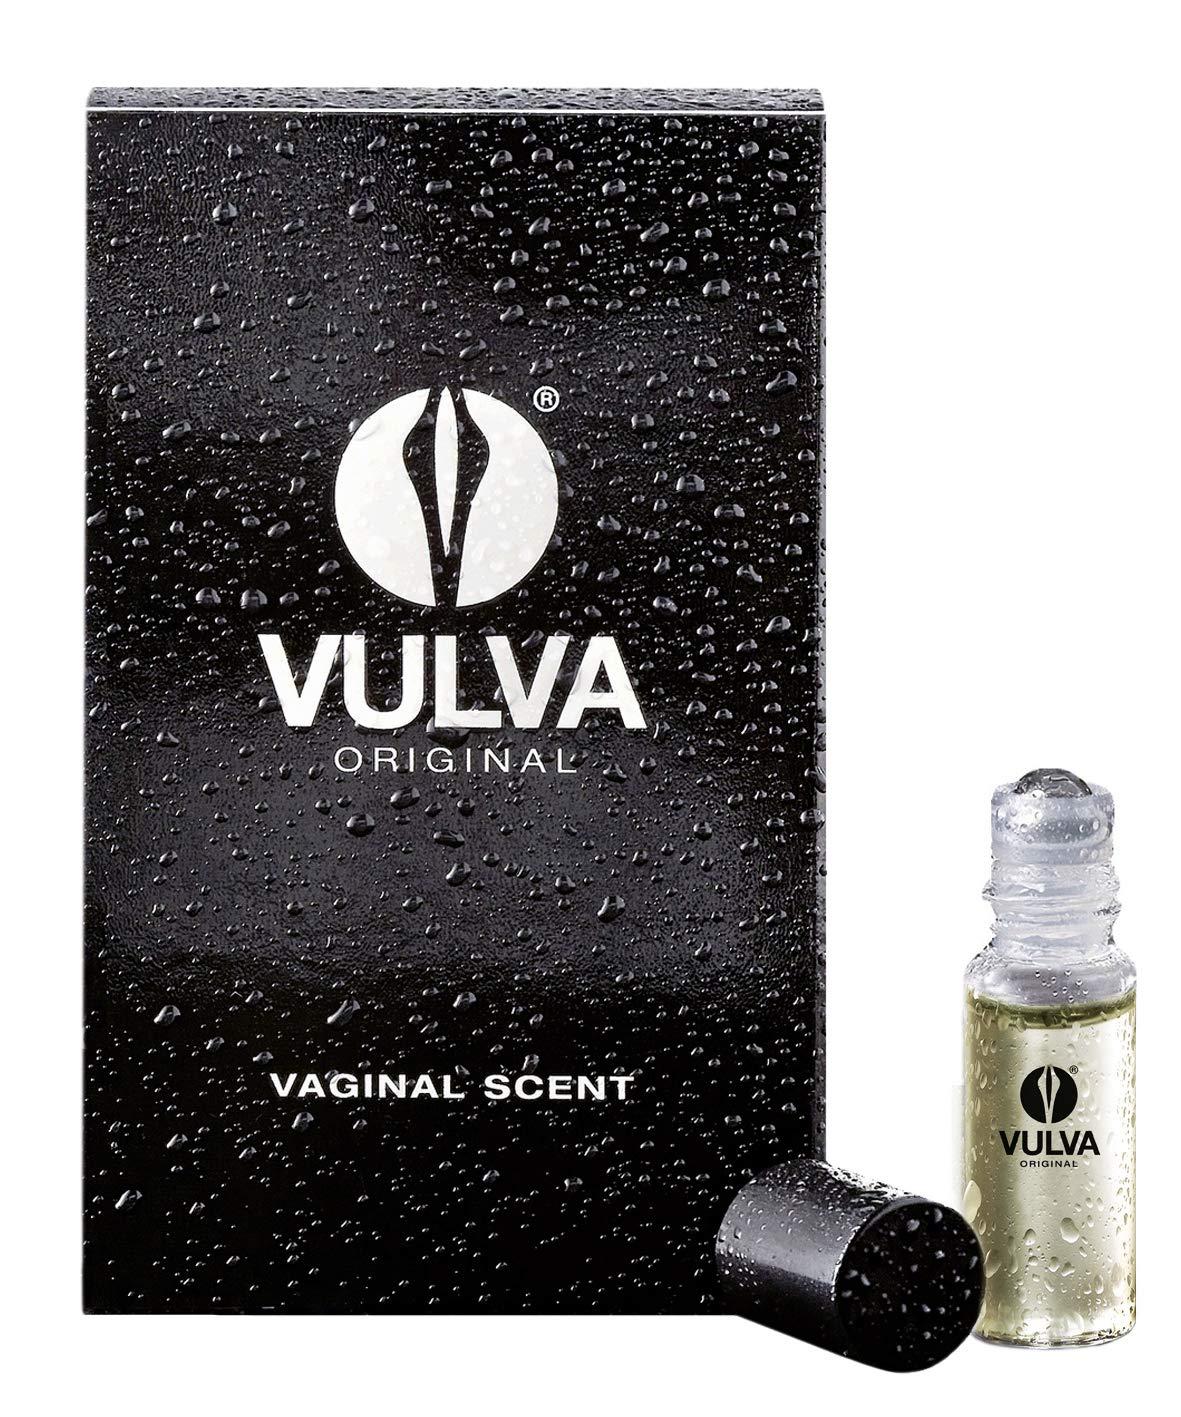 VULVA Original - Auténtica fragancia vaginal para el disfrute ...